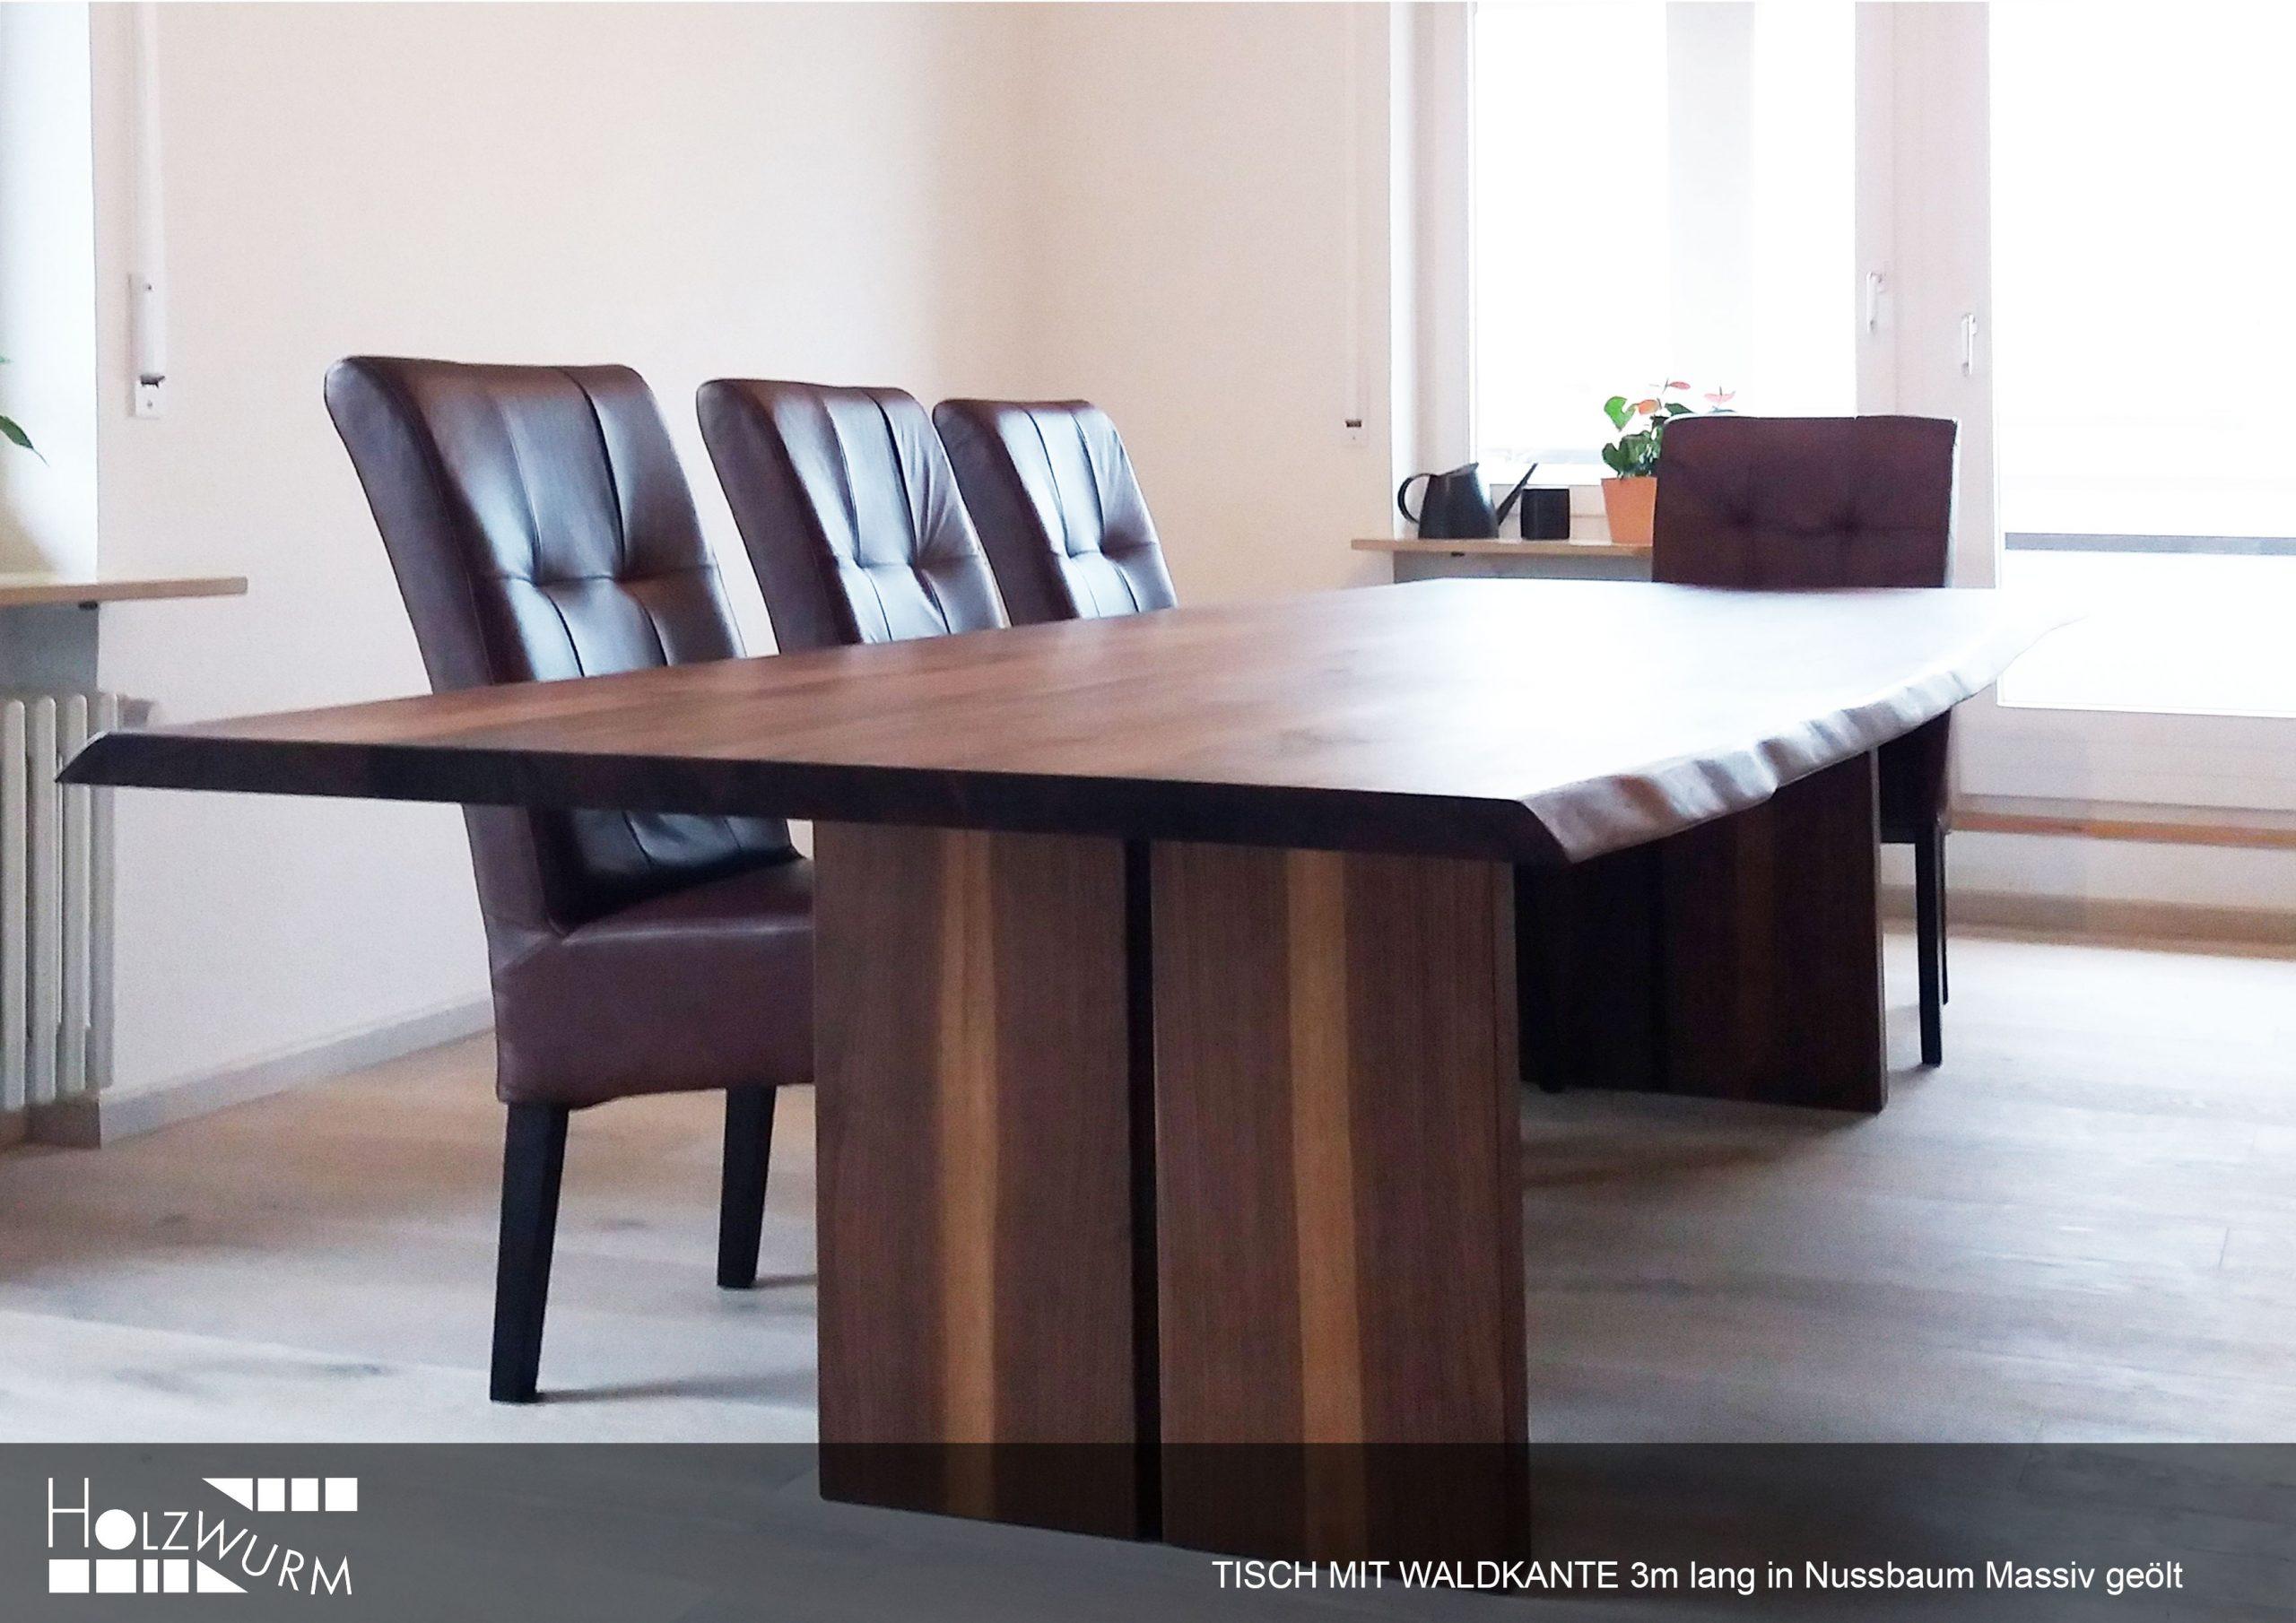 Tisch Massivholz Waldkante Nussbaum geölt